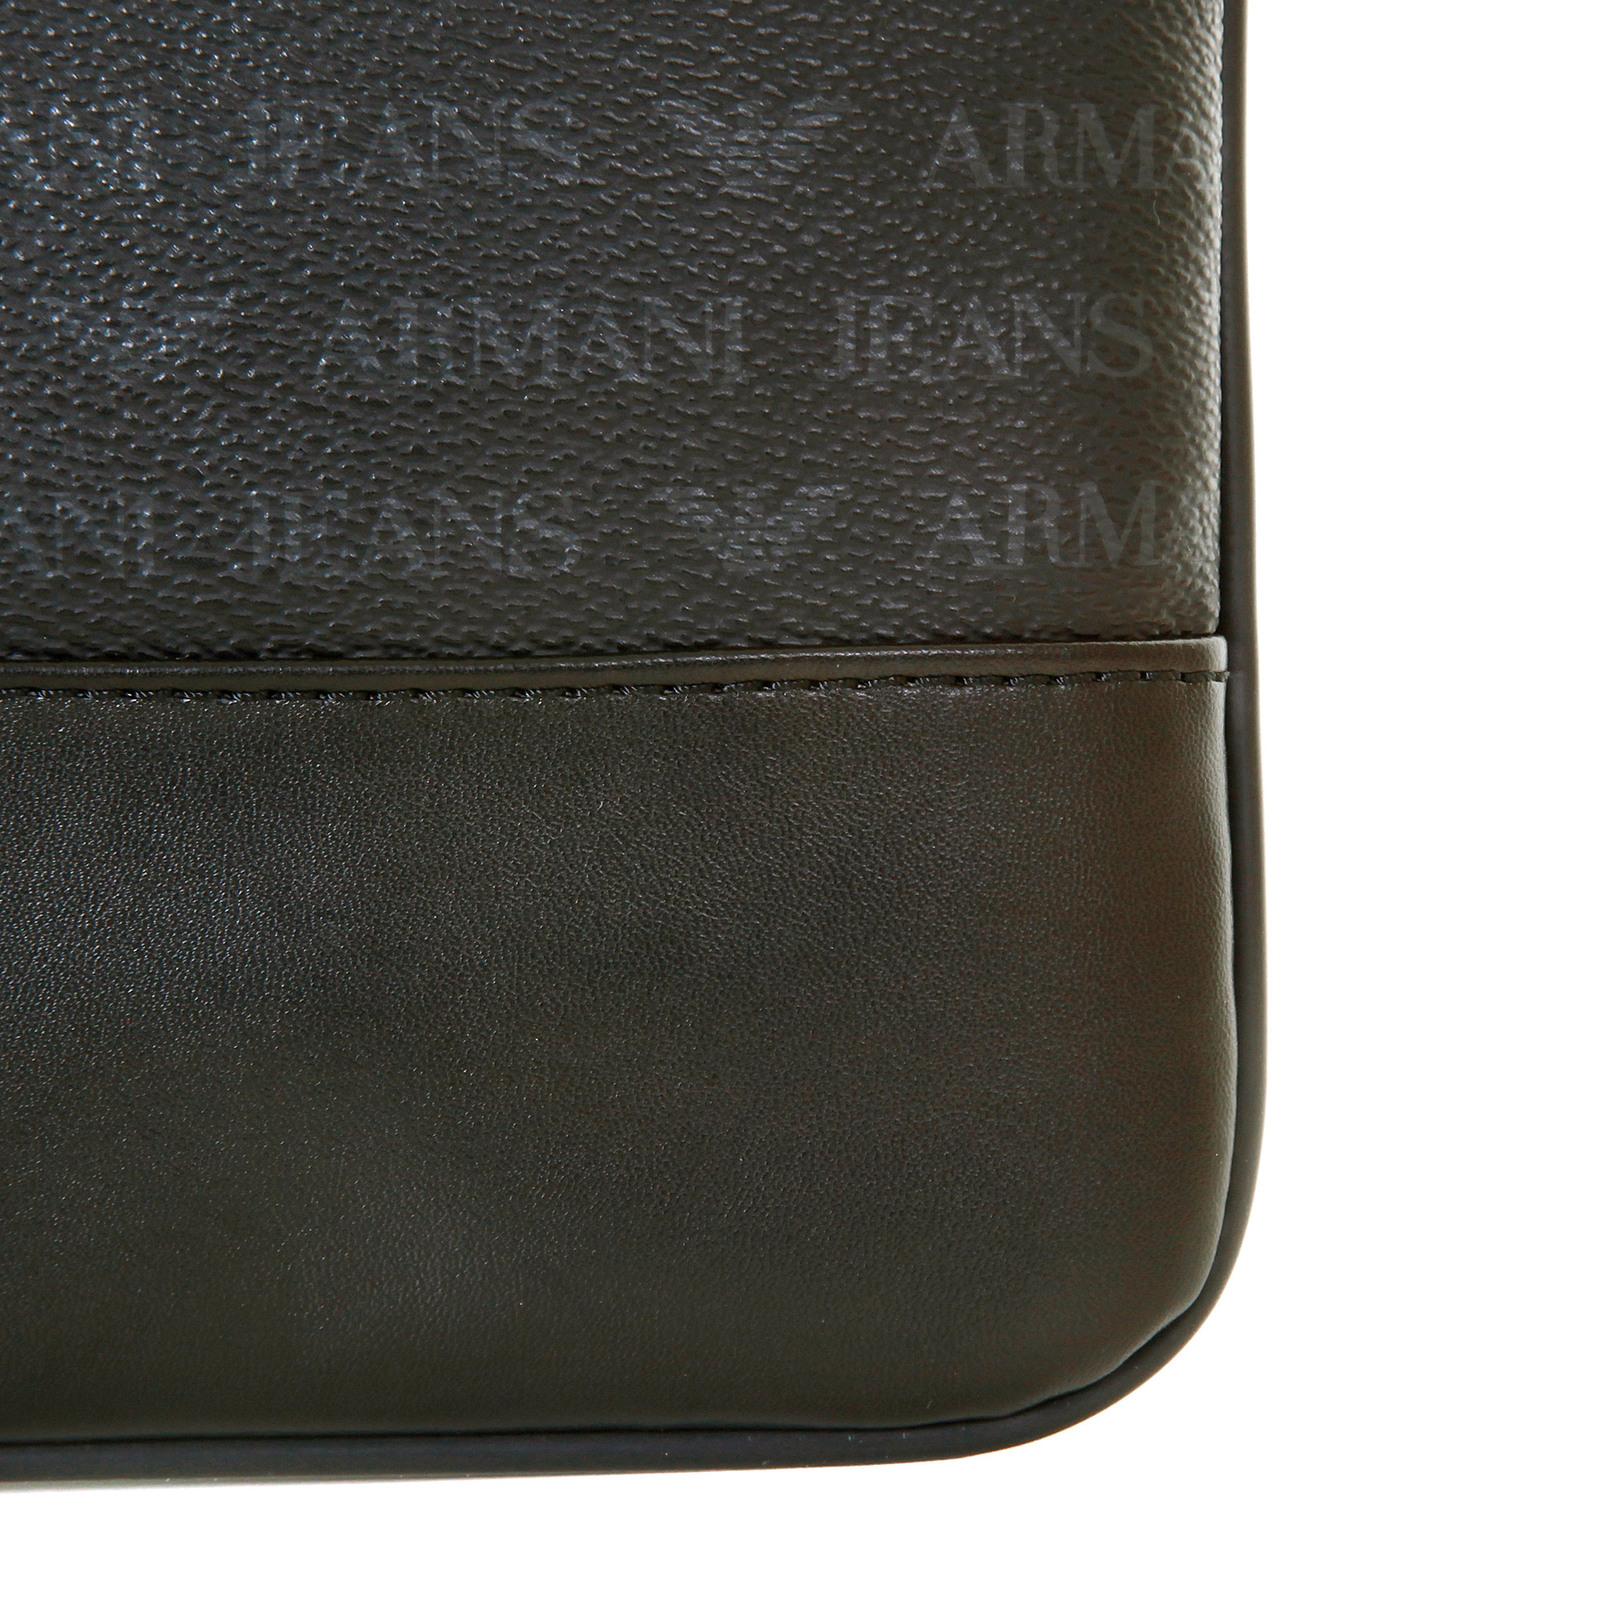 Armani Jeans mens black logo small messenger bag AJM2473 at Togged ... a7c81010238c3